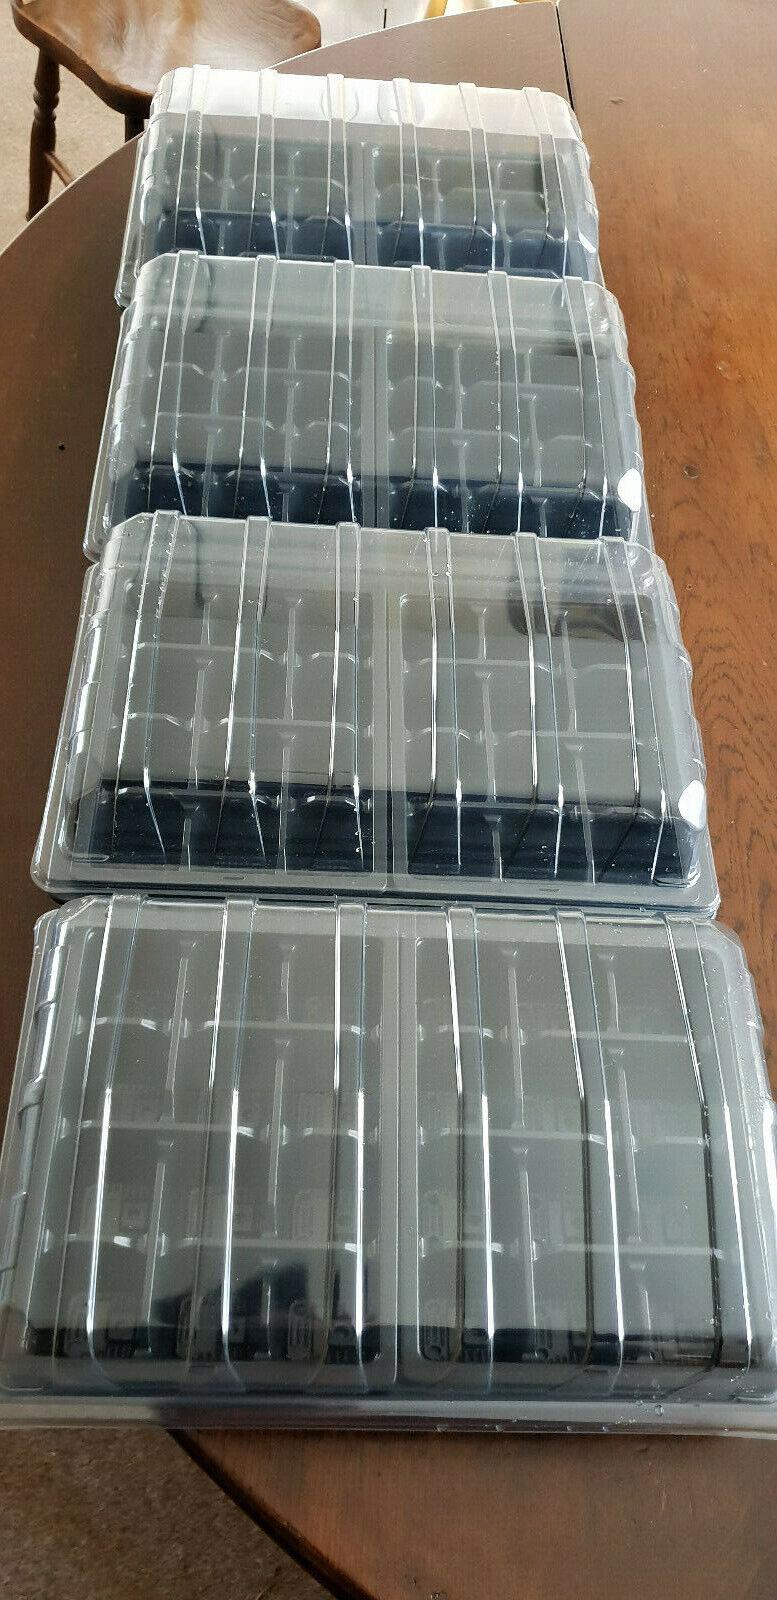 PLANT PROPAGATION 3 PIECE TRAYS: 8 Inserts + 4 HD Trays + 4 Clear Lids 96 cells